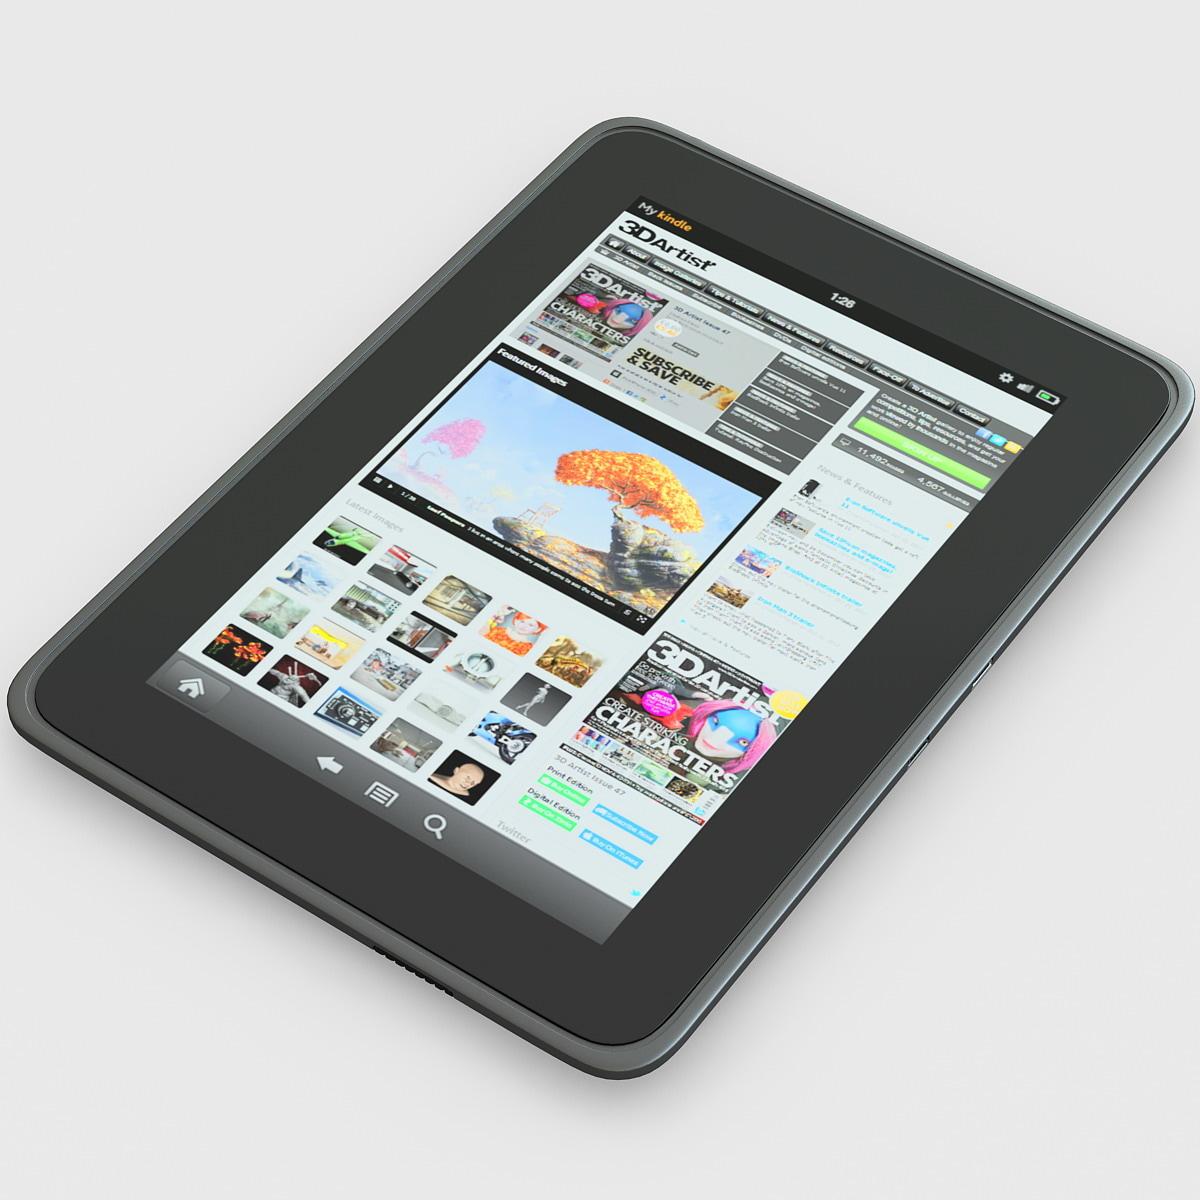 3dsmax kindle hd 7 tablet